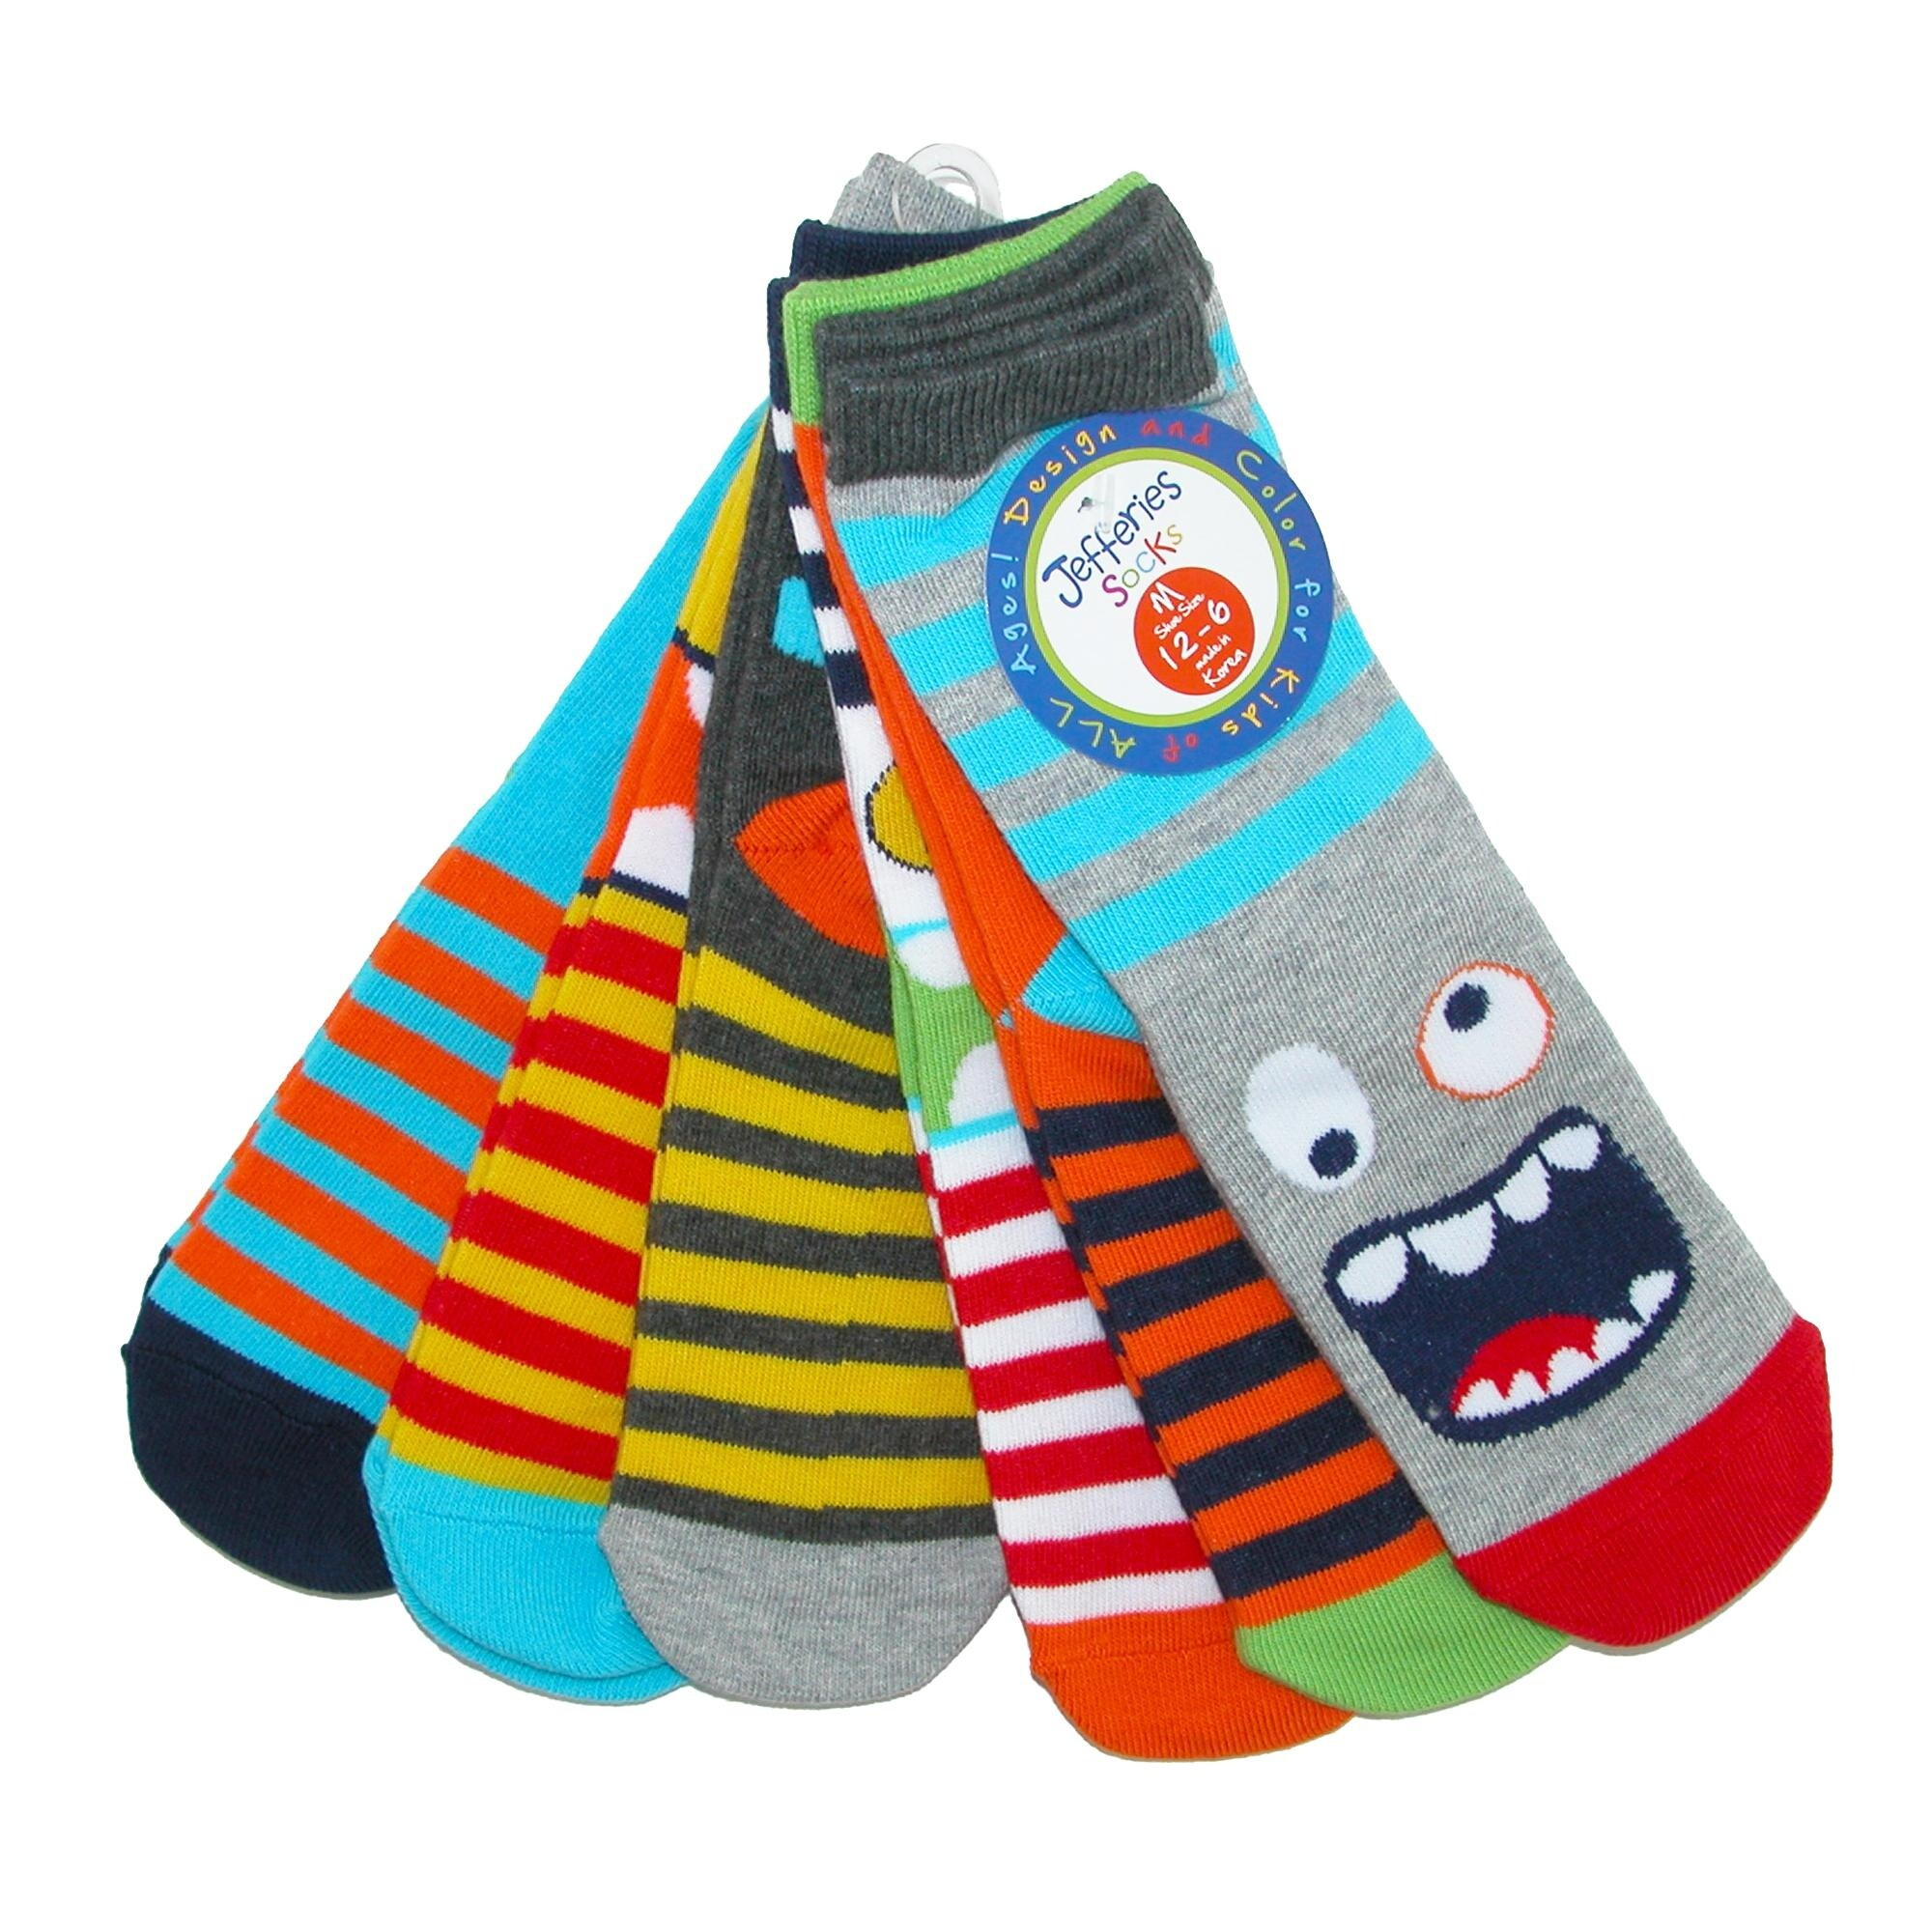 Jefferies Socks Boys Little Fun Colorful Dress Crew Socks 6 Pair Pack